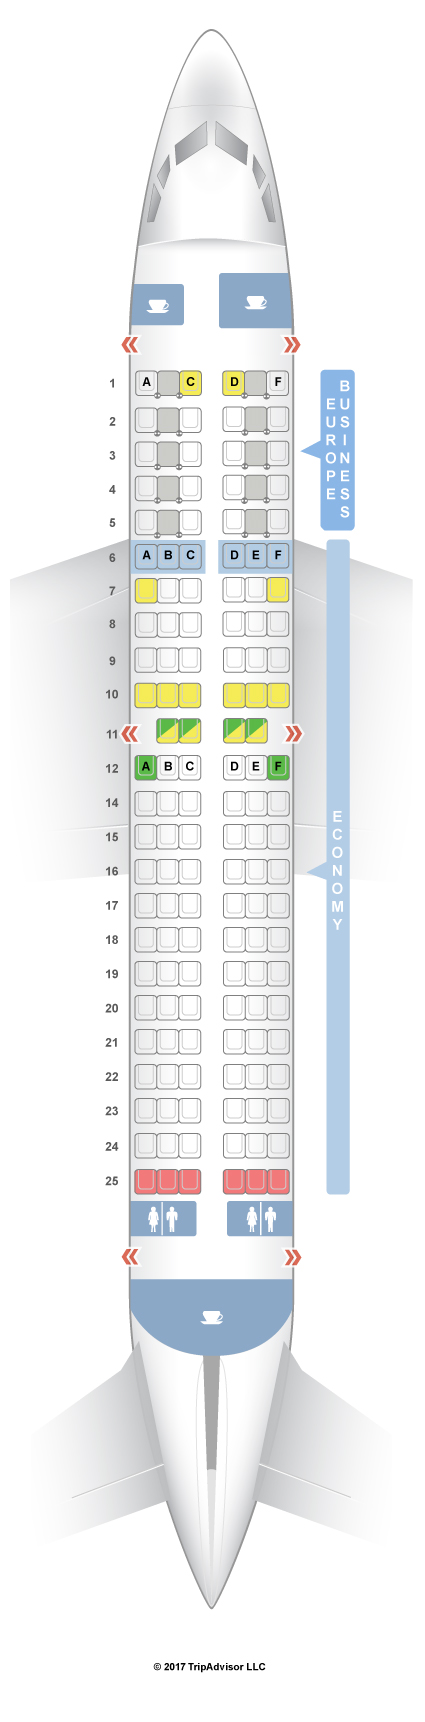 Seatguru Seat Map Klm Boeing 737 700 737